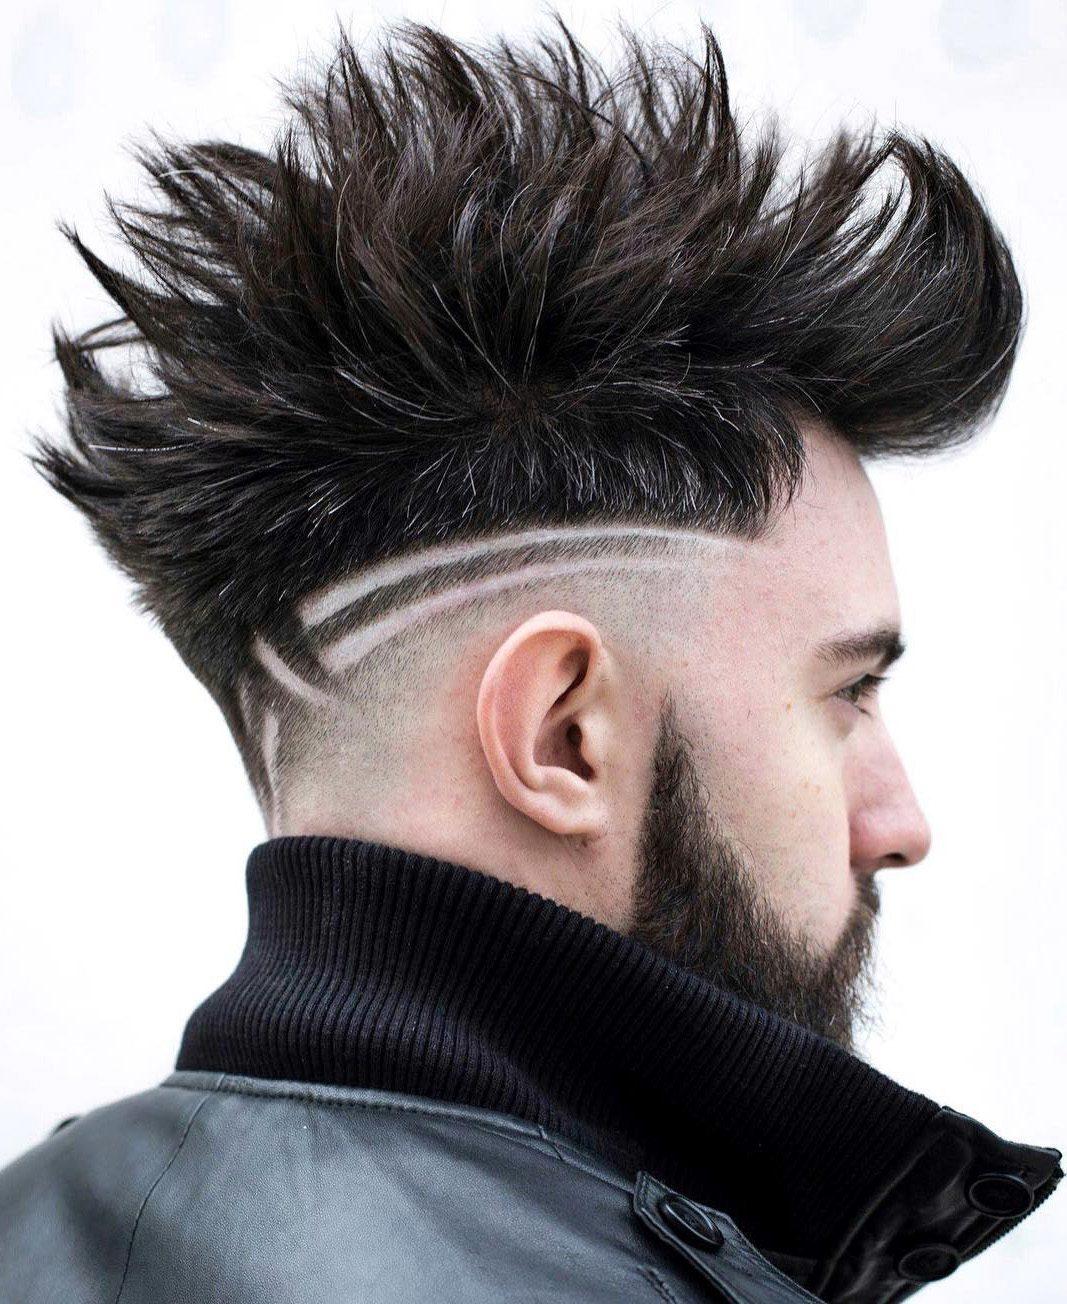 Spiky Brush Up and Hardline Design